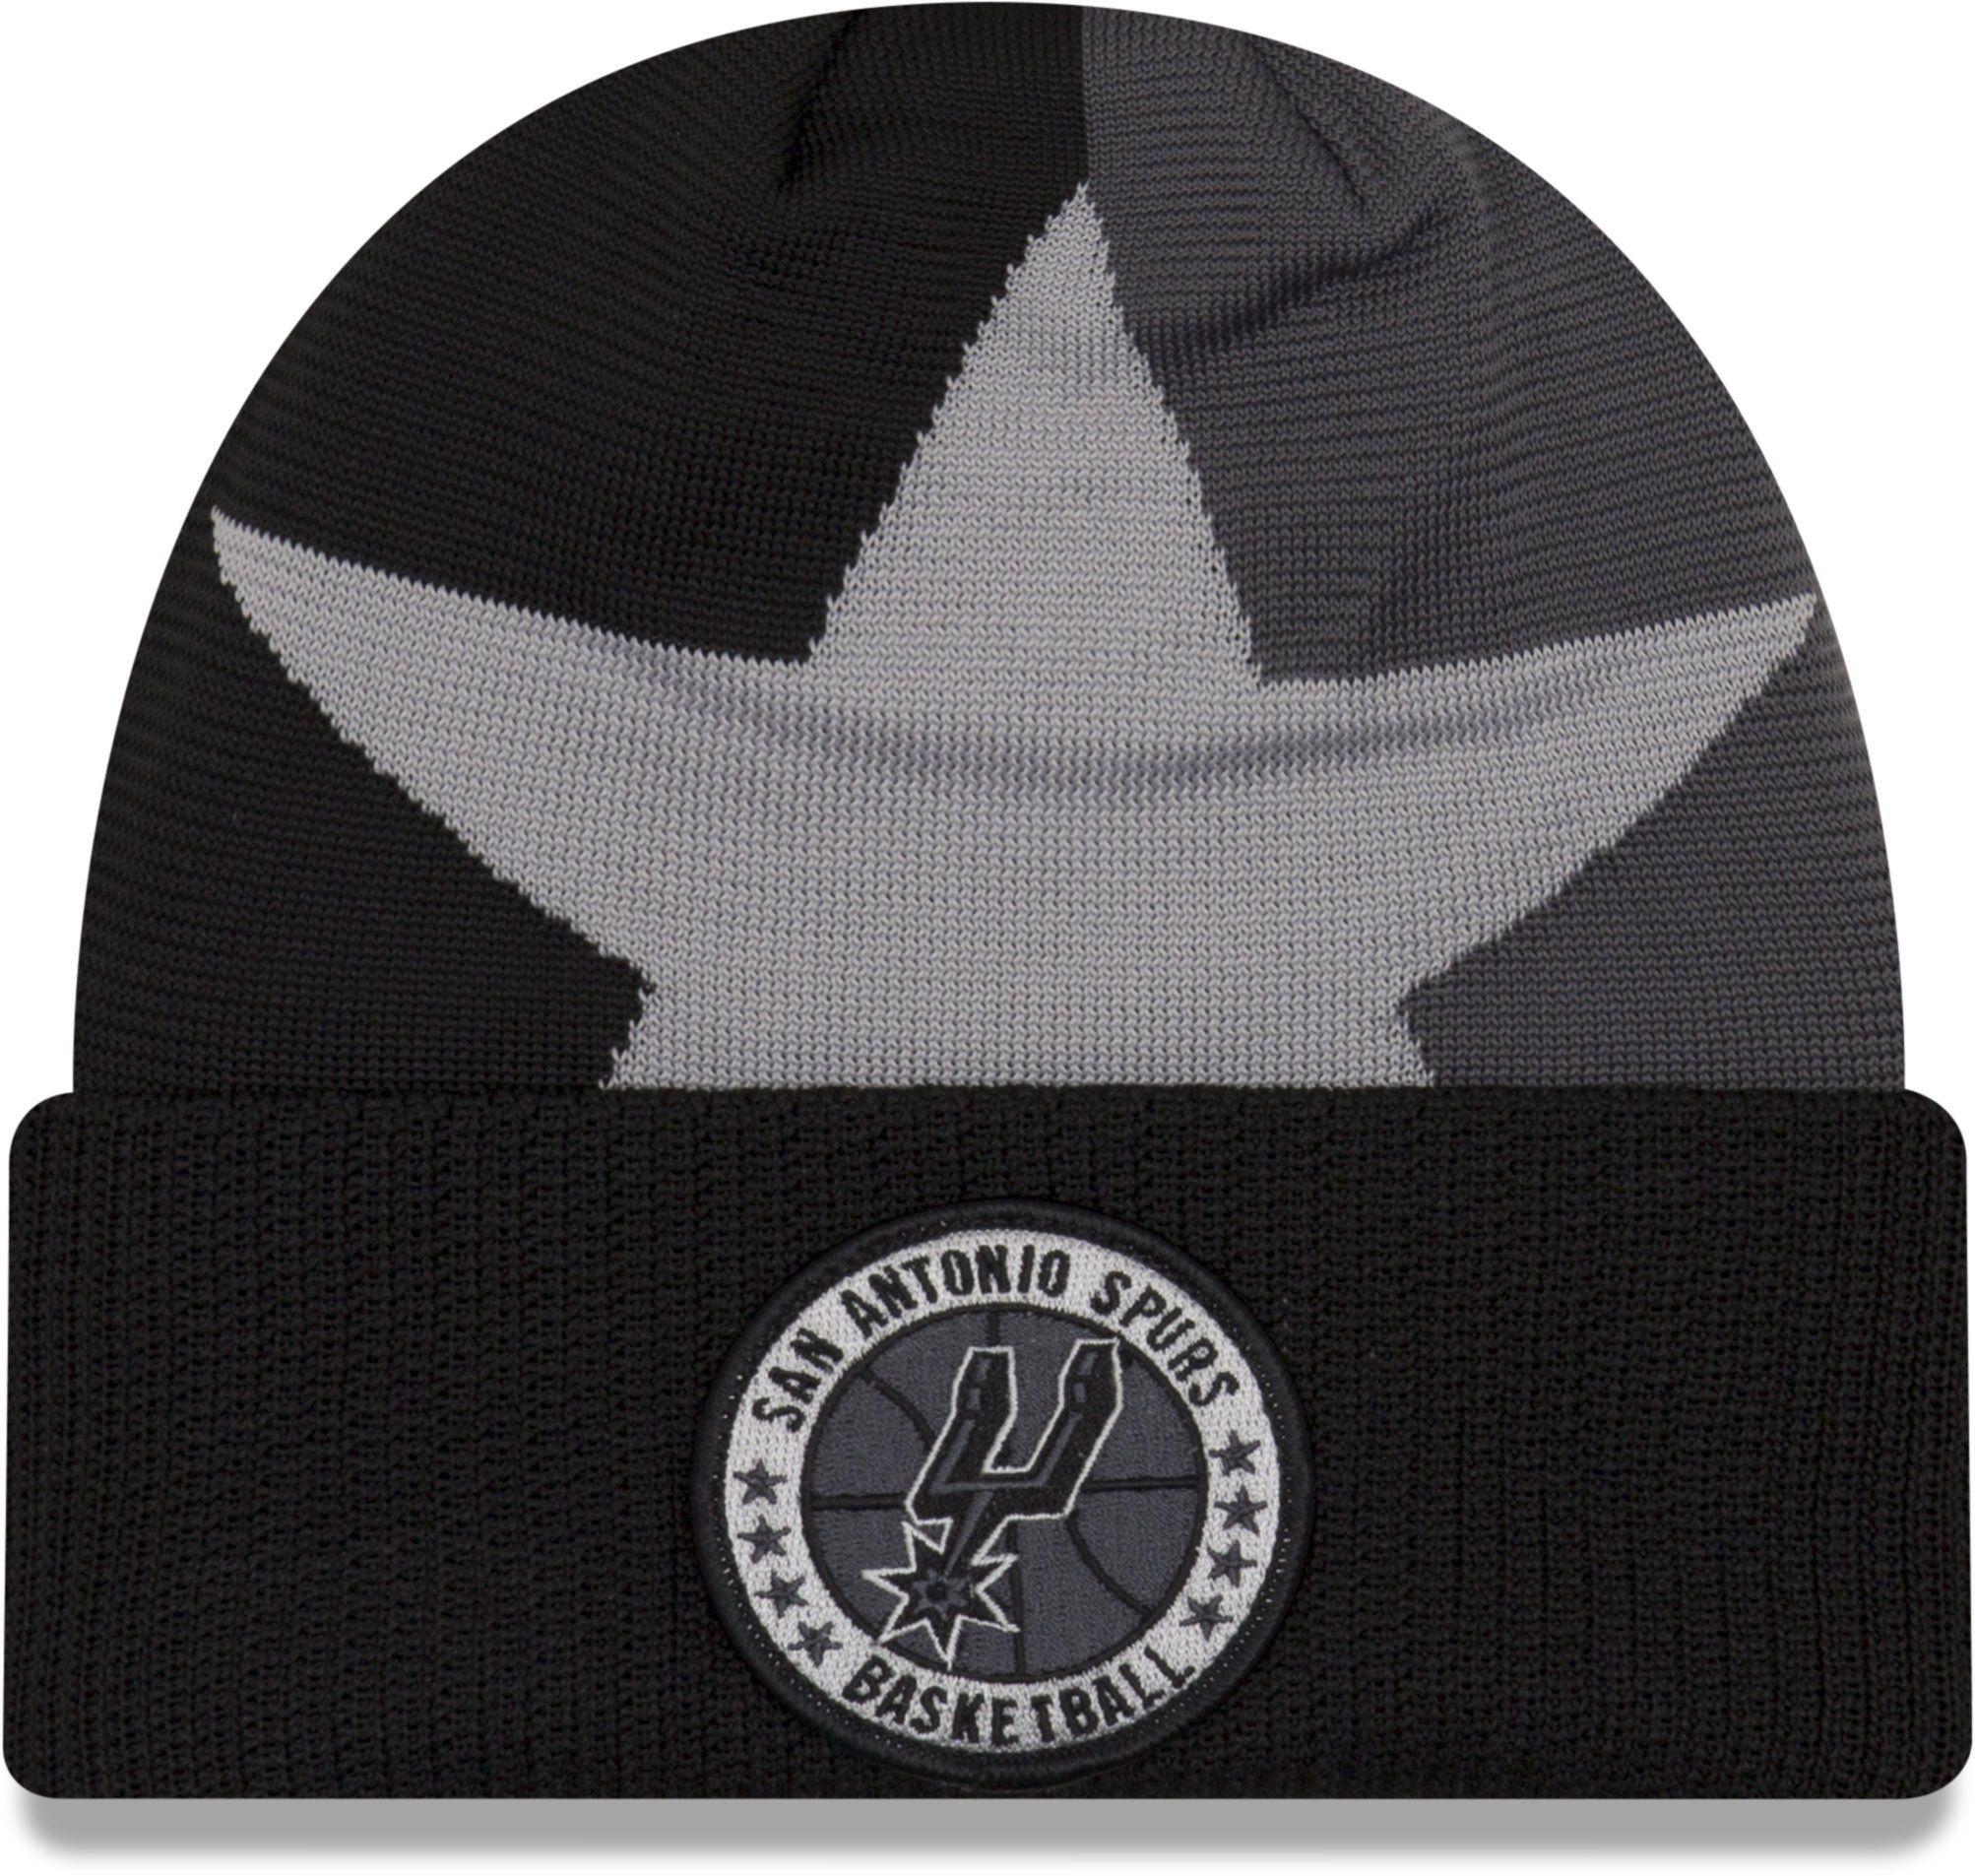 a8e15d1be2f5b San Antonio Spurs NBA 2018 Tip Off Series New Era Knit Beanie – lovemycap